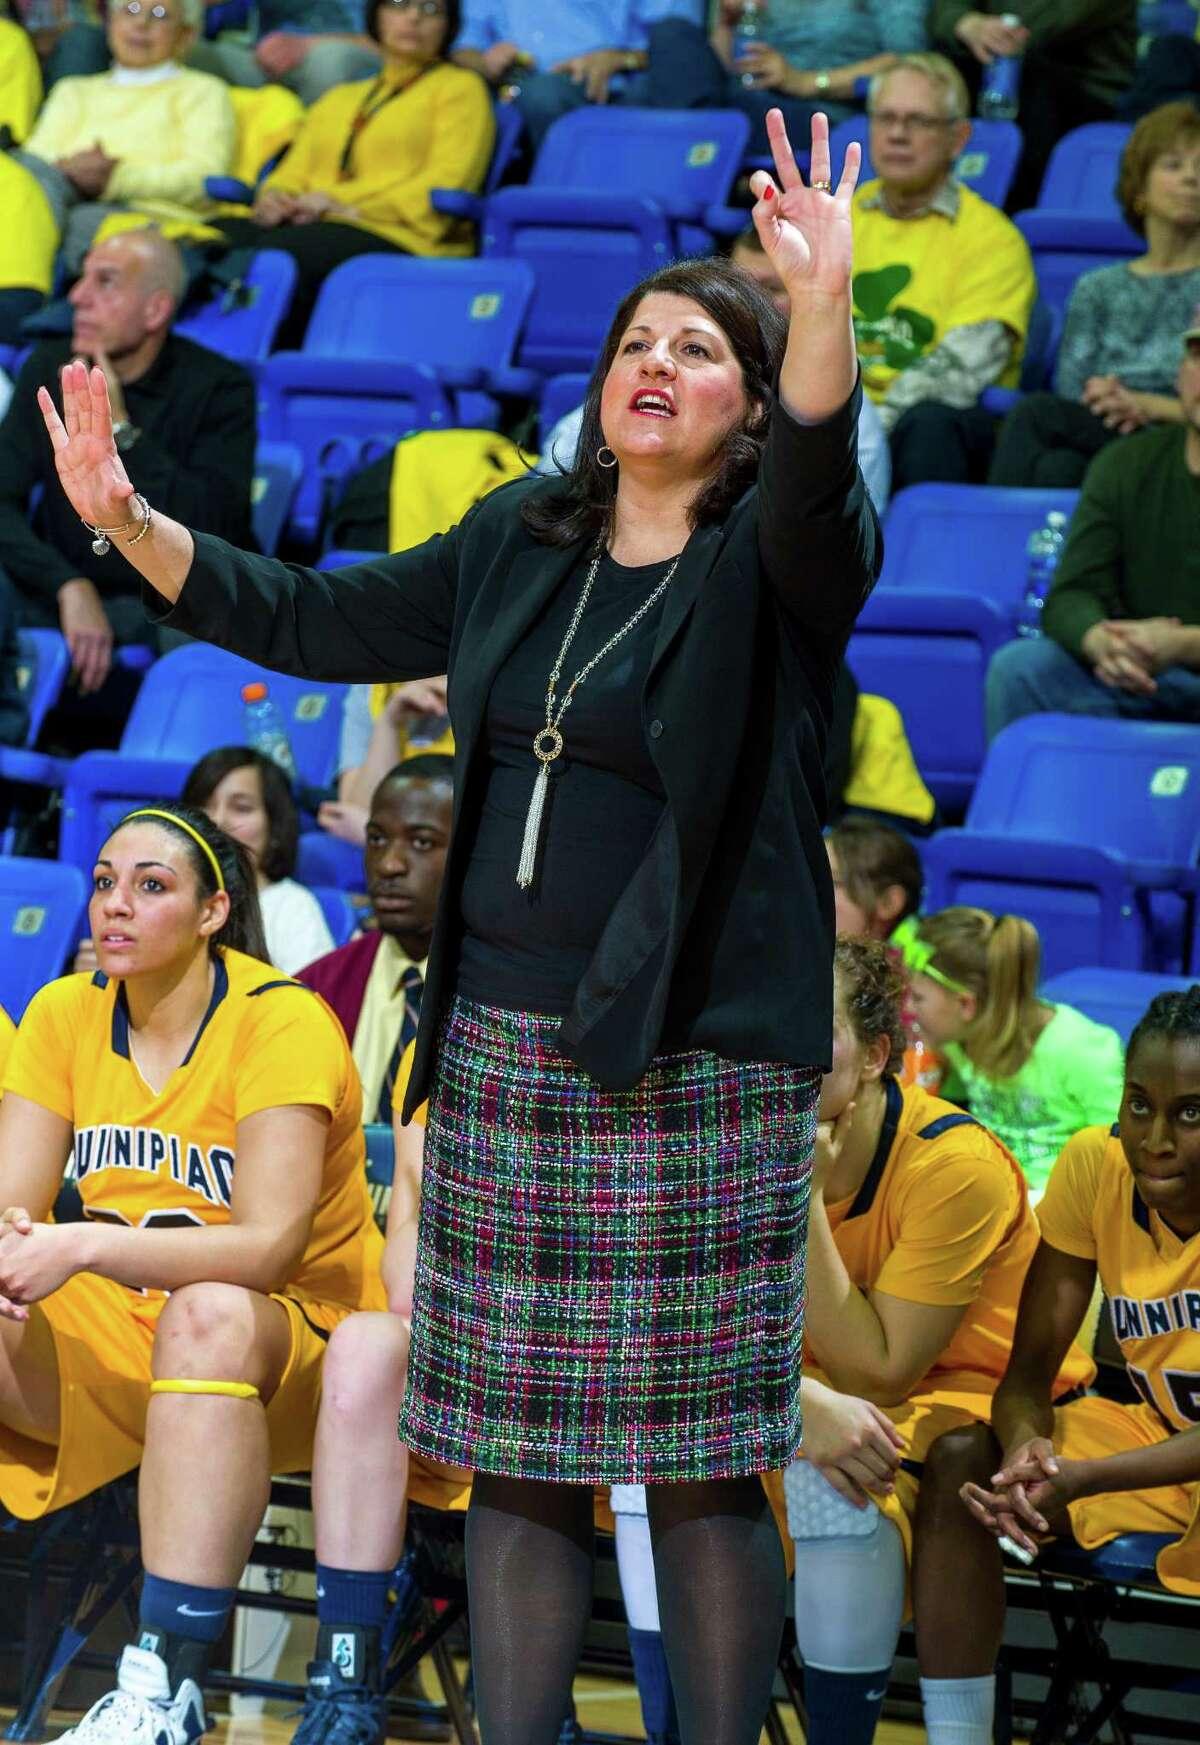 Quinnipiac women's basketball coach Tricia Fabbri. Courtesy photo of Quinnipiac